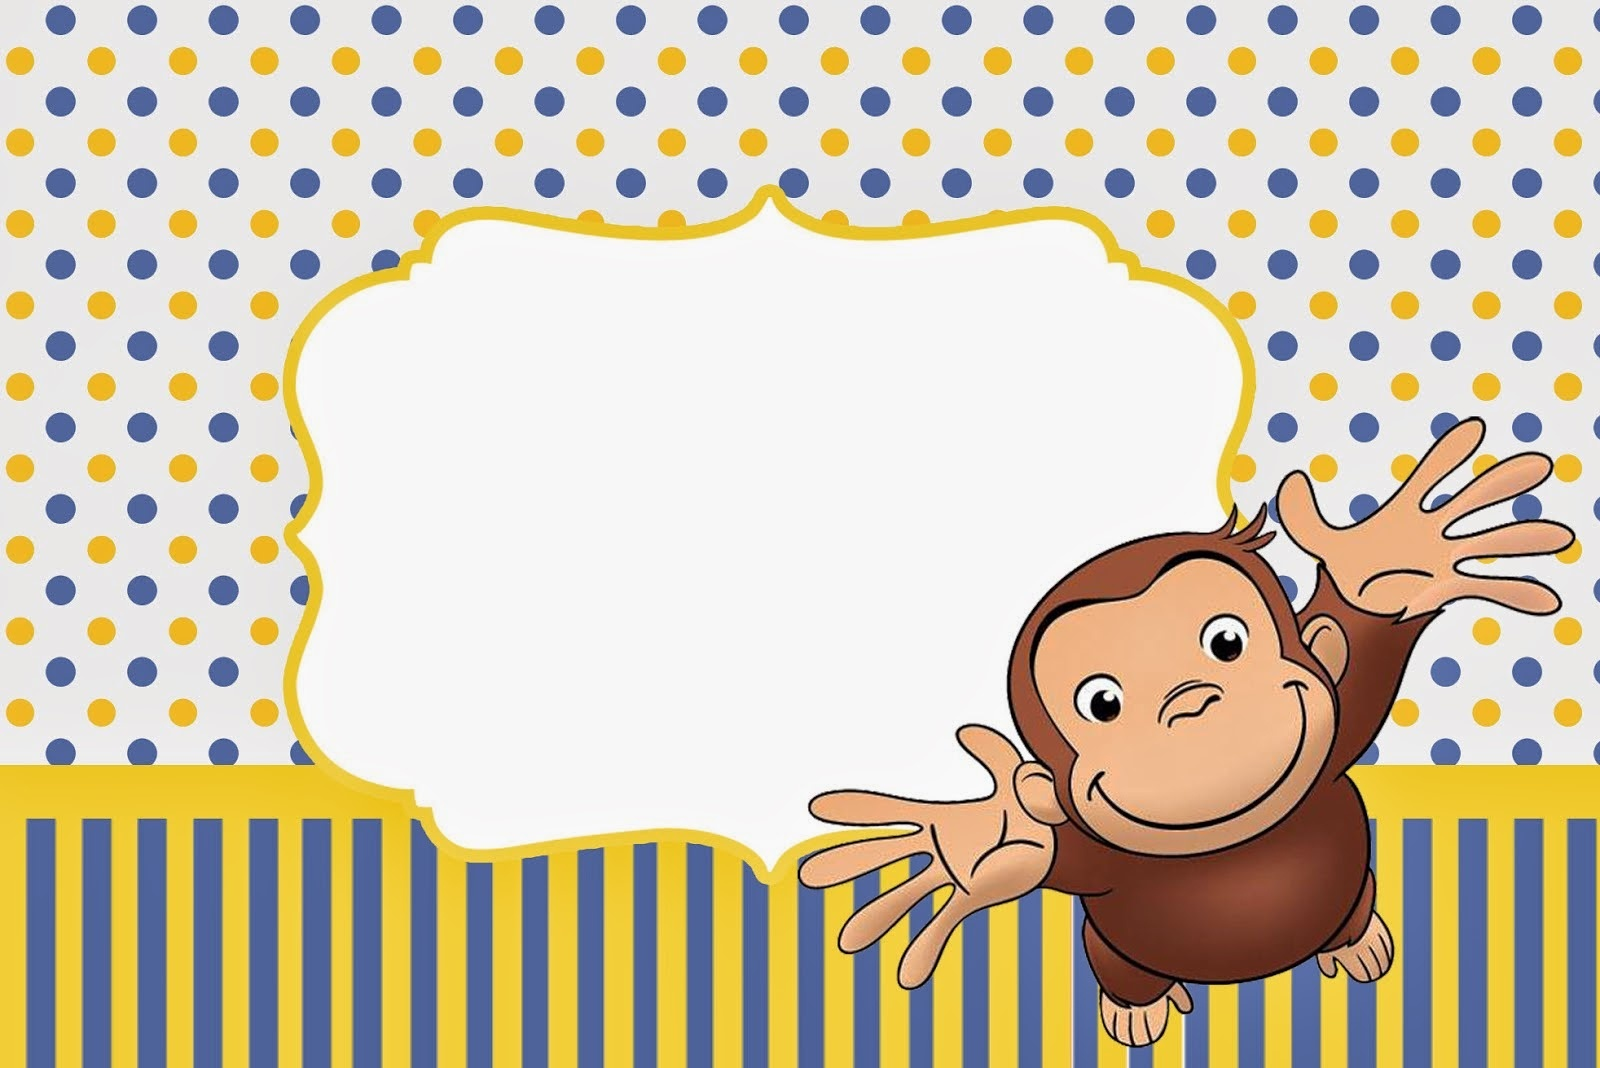 Curious George Free Printable Invitations. - Oh My Fiesta! In English - Free Printable Curious George Invitations